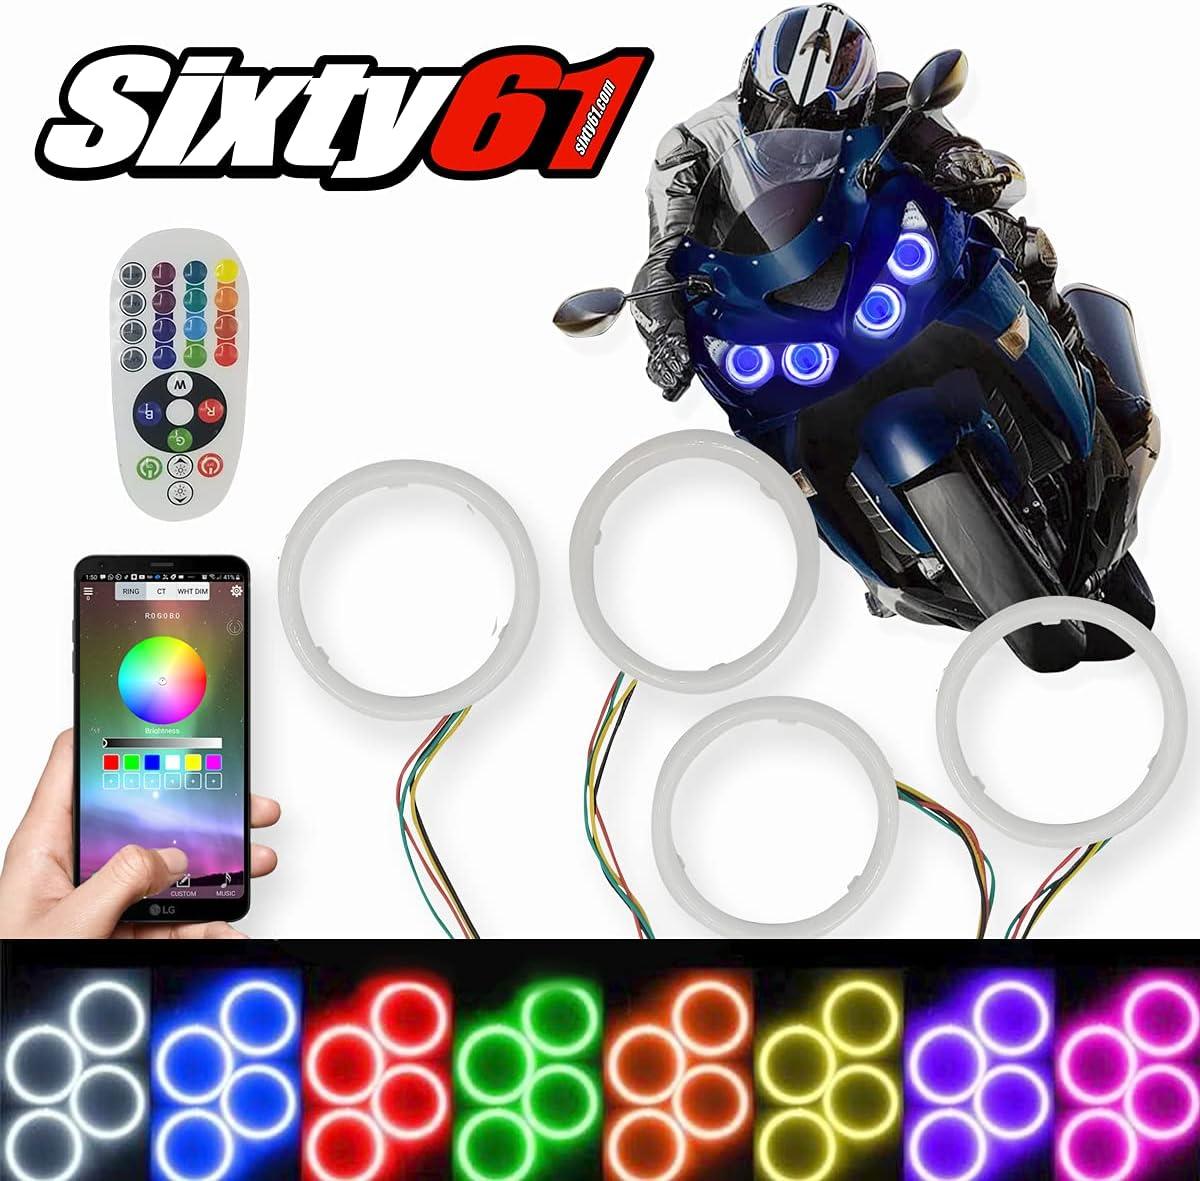 Fort Worth Mall Sixty61 Multi Color Changing Plasma Max 79% OFF for ZX1 Ninja Kawasaki Halos